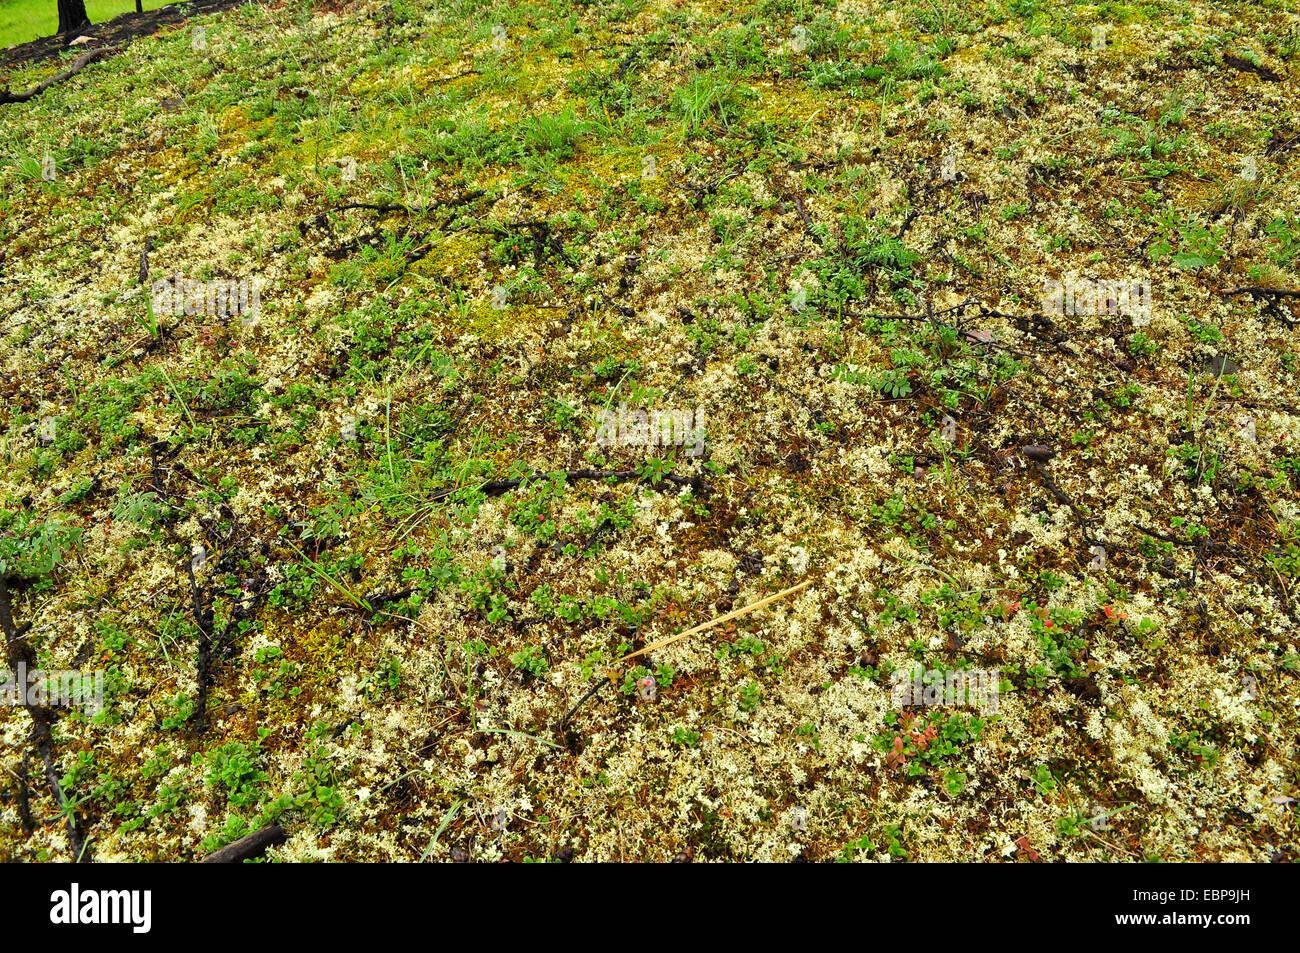 background arctic tundra vegetation lichen stockfotos background arctic tundra vegetation. Black Bedroom Furniture Sets. Home Design Ideas